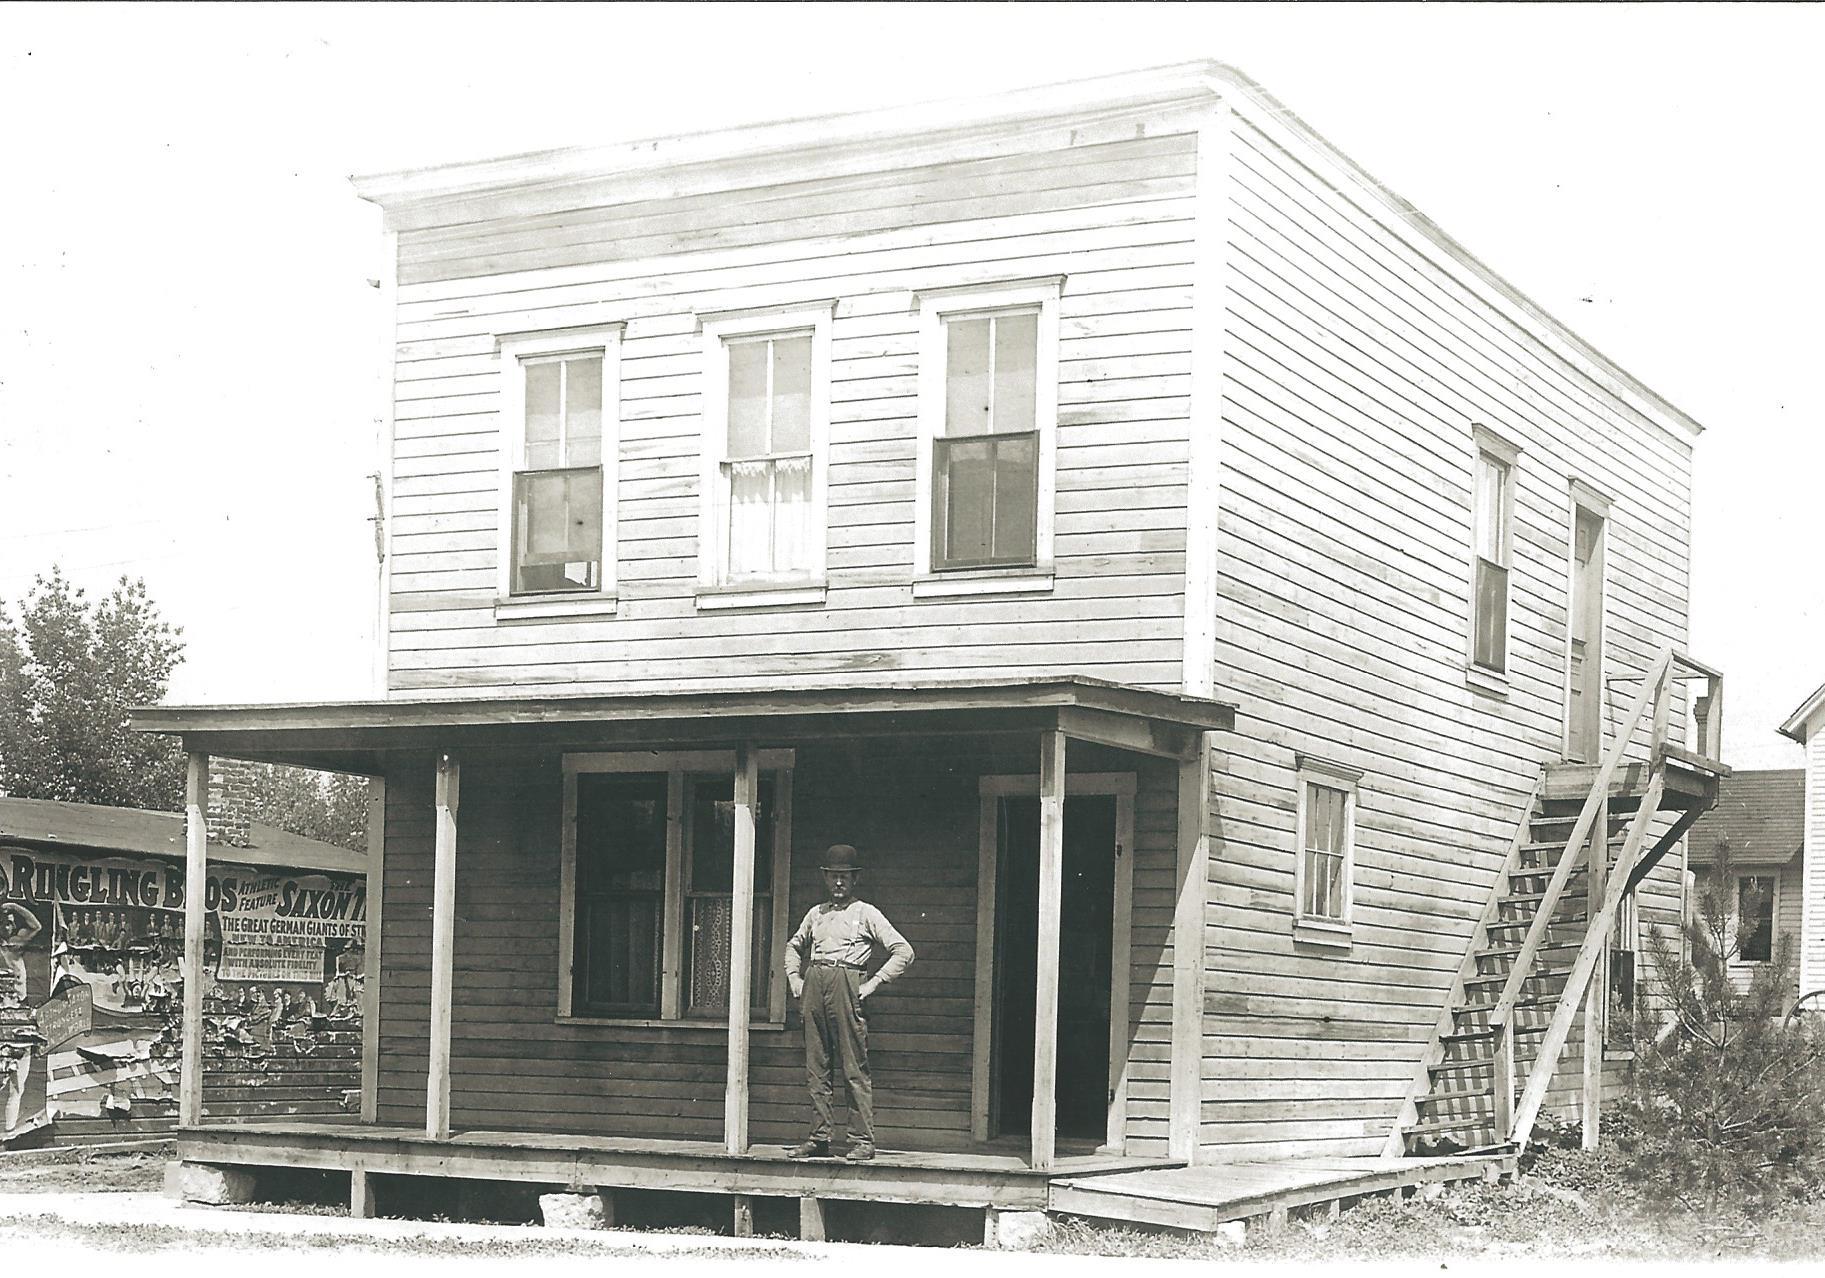 1910 Hayward Boarding House